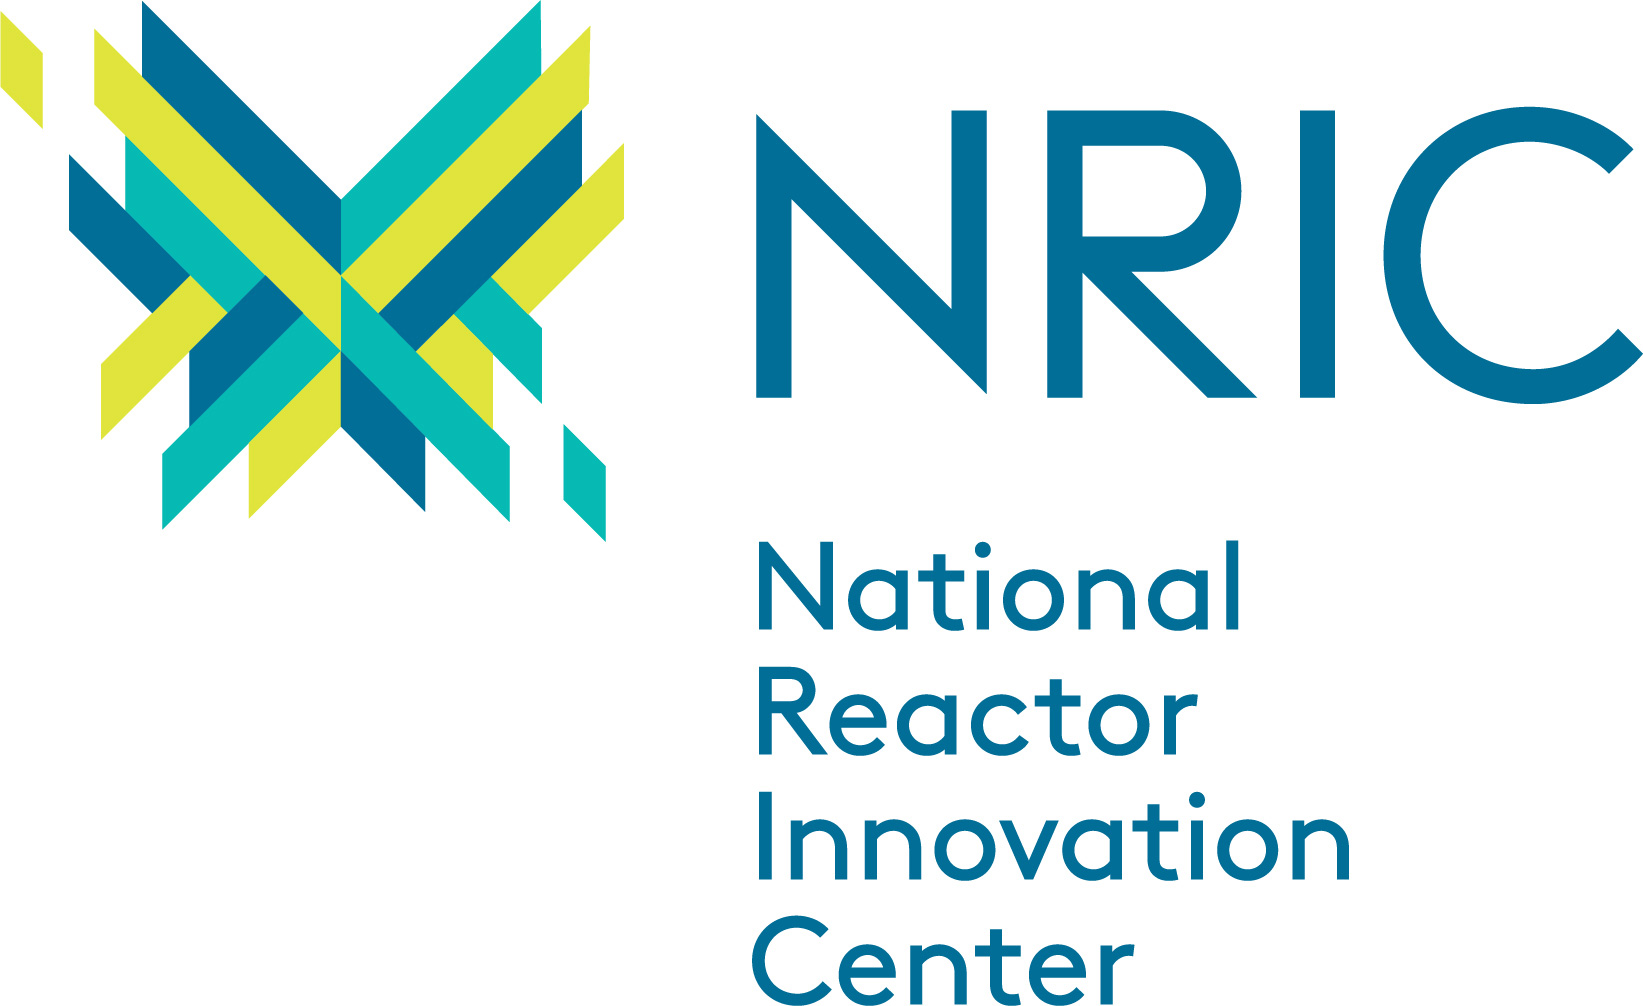 National Reactor Innovation Center